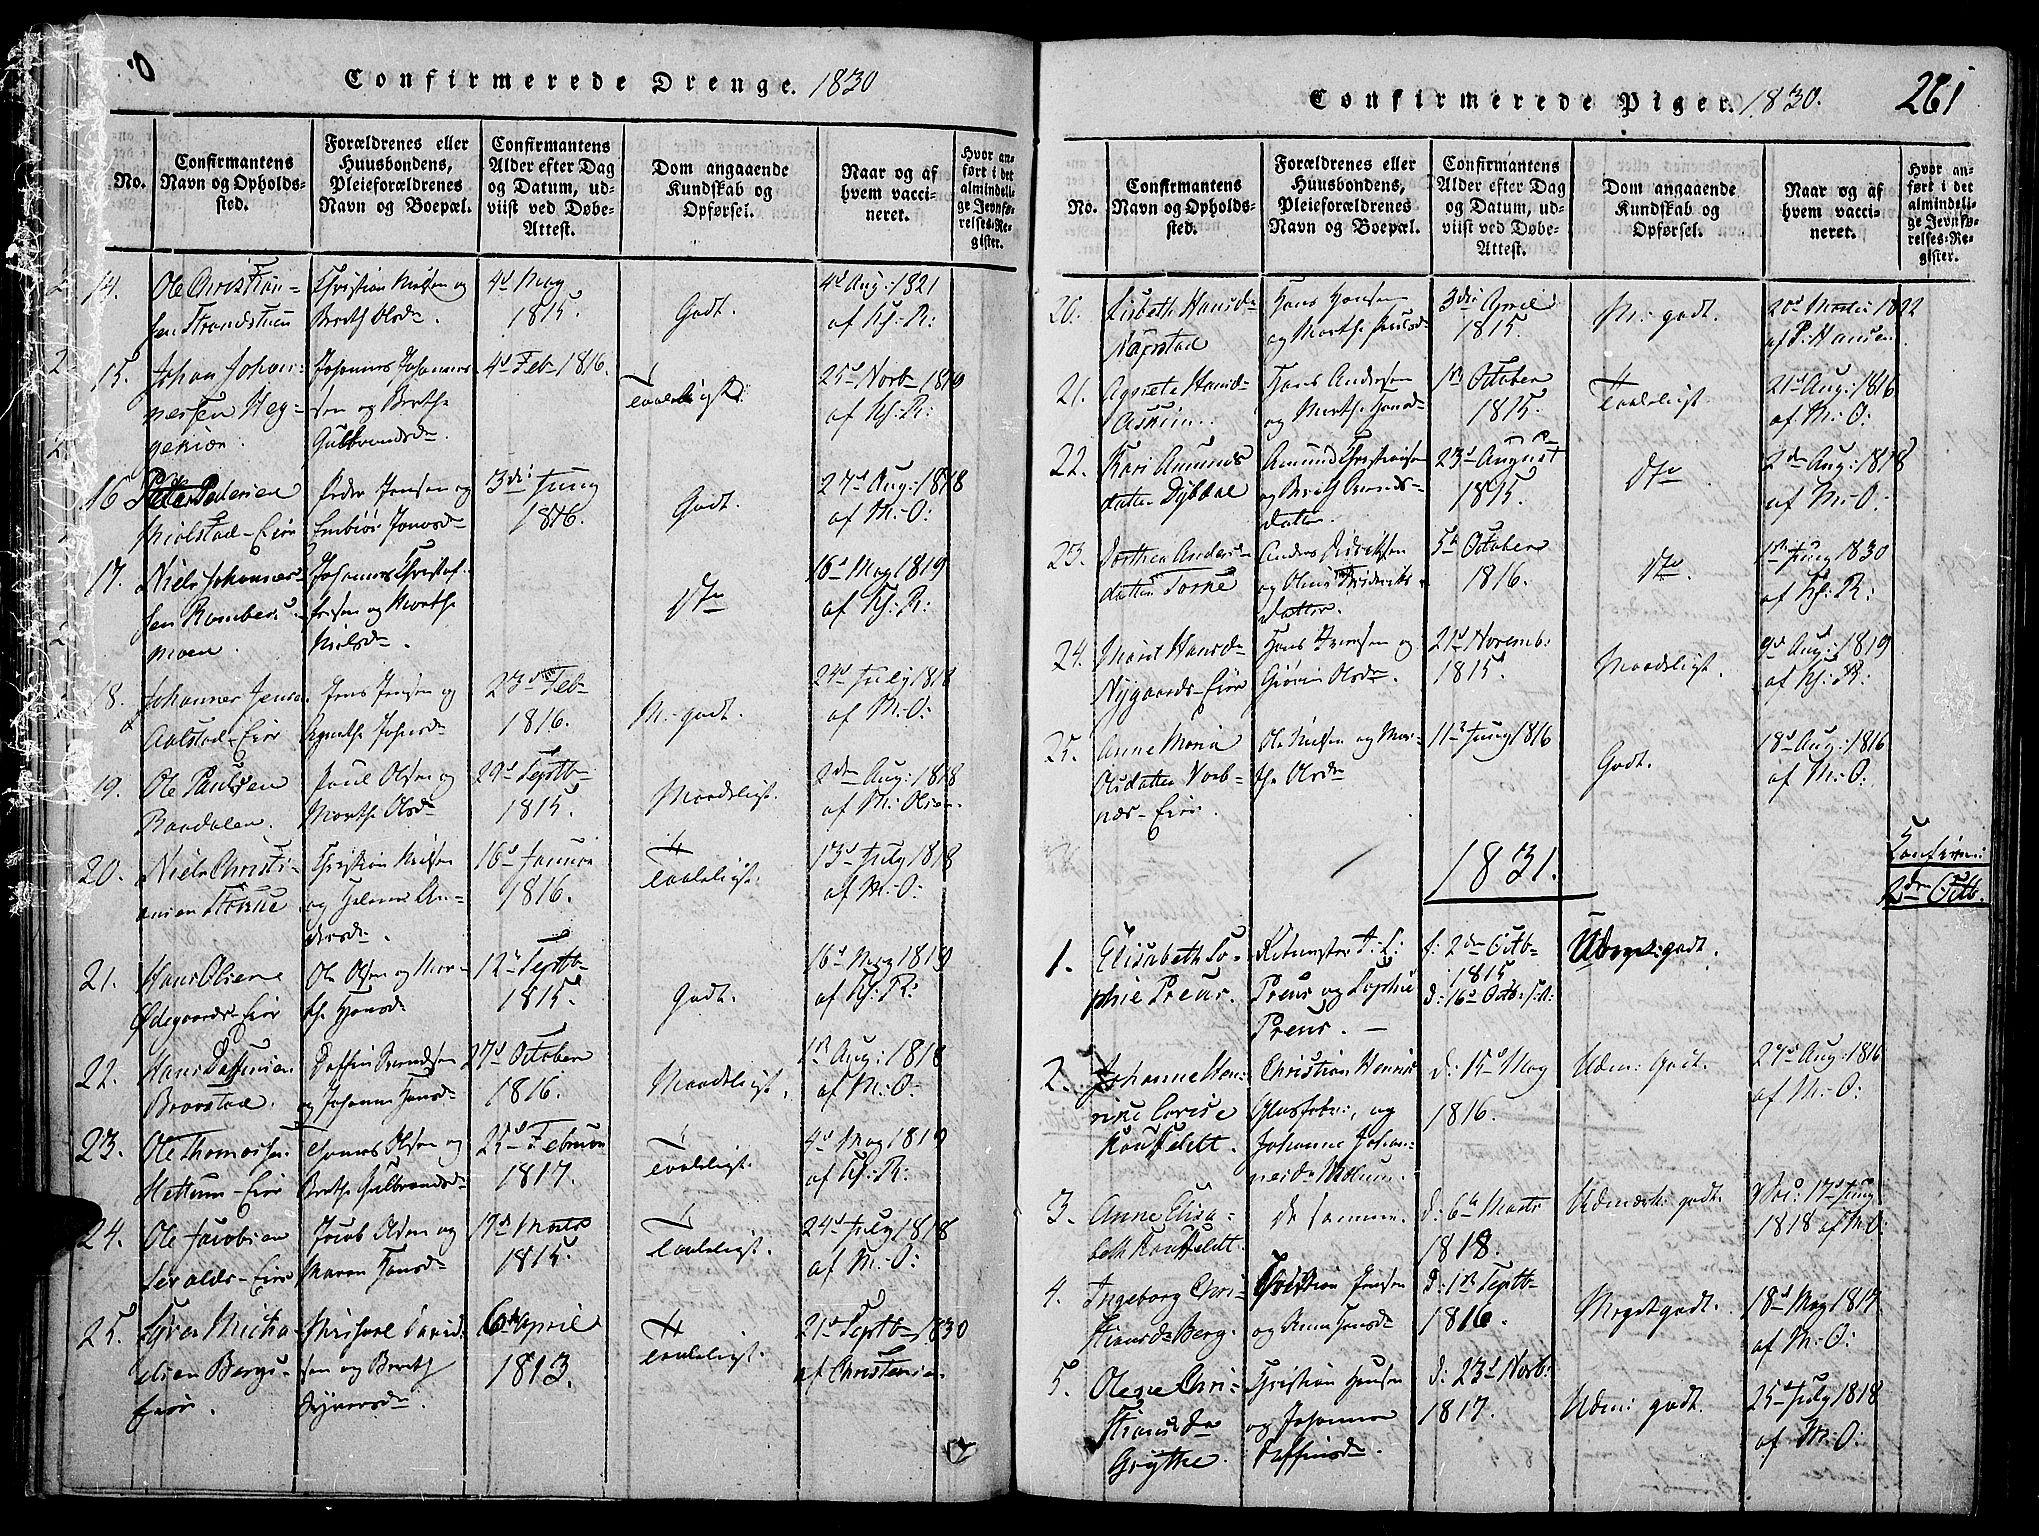 SAH, Vardal prestekontor, H/Ha/Haa/L0004: Ministerialbok nr. 4, 1814-1831, s. 261